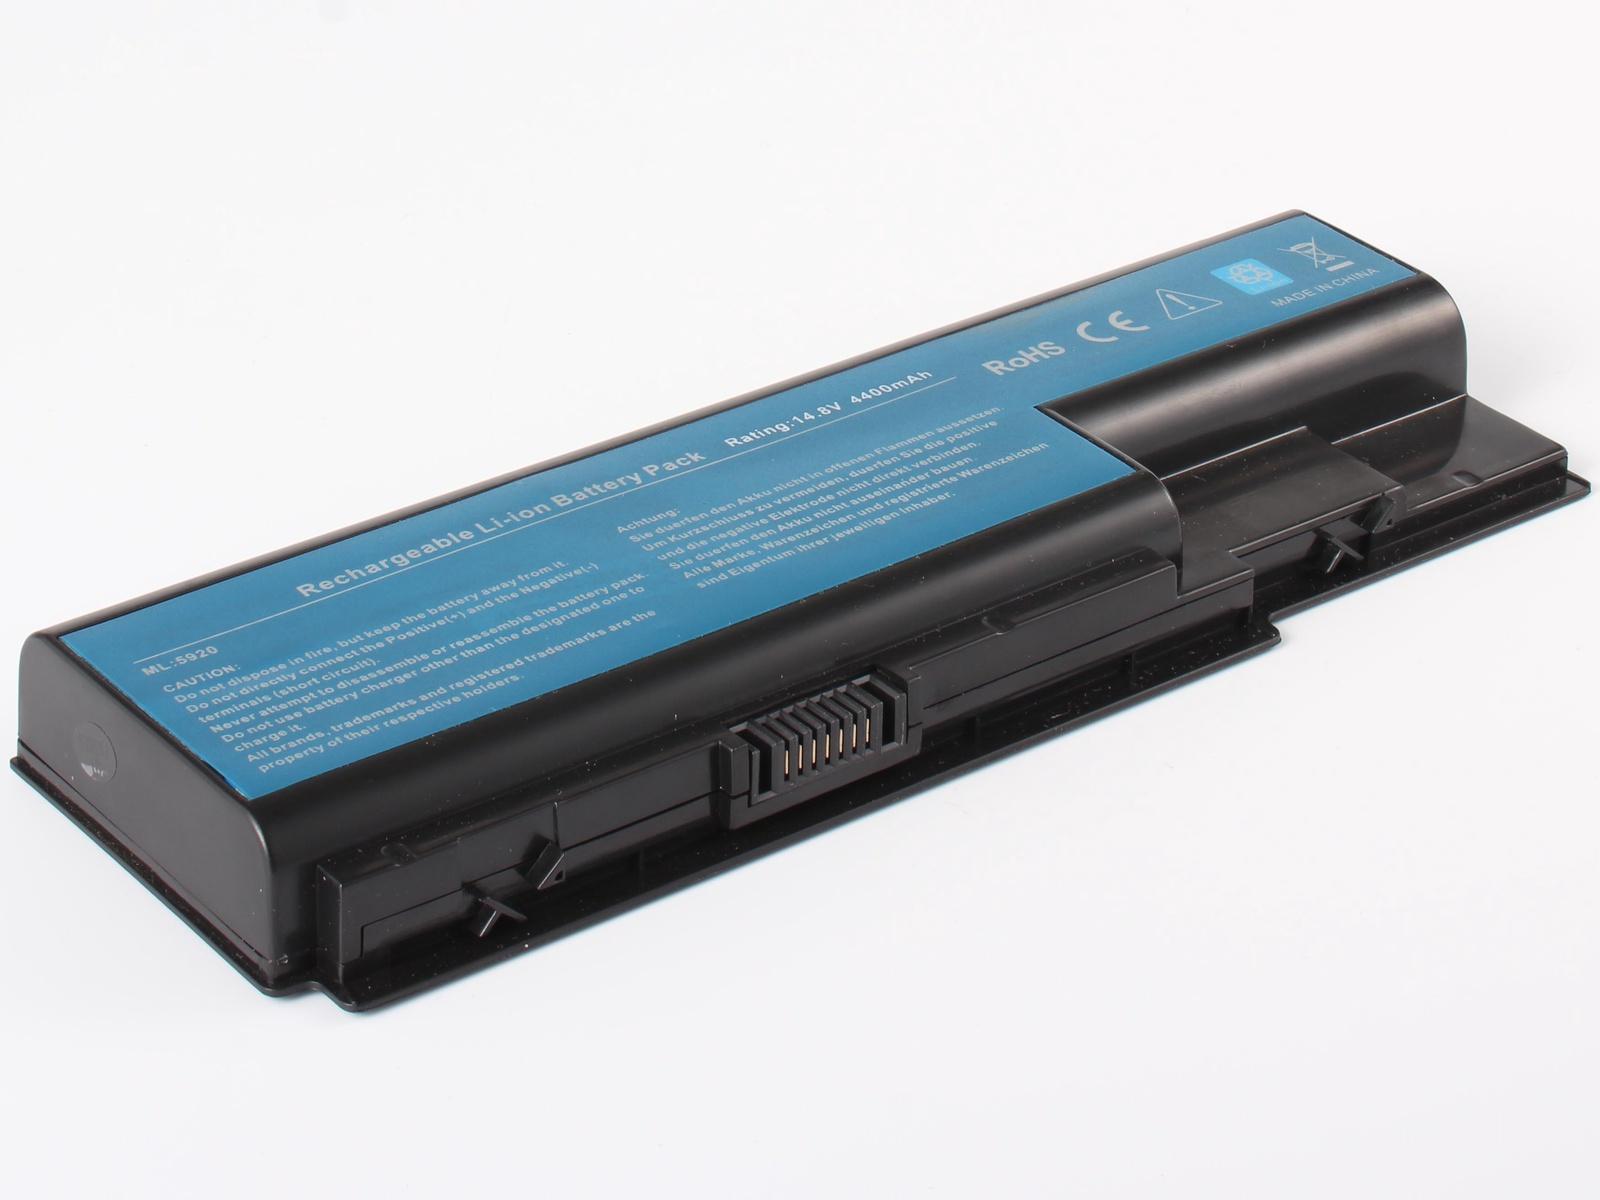 Аккумулятор для ноутбука AnyBatt для Acer Aspire 7540G-304G32Mi, Extensa 7630Z, Aspire 5710Z, Aspire 5720G-302G16Mi, Aspire 5920G-1A1G16Mi, Aspire 7736ZG-444G32Mi, Aspire 5730ZG-323G25MI, Aspire 8730G, Aspire 5530-602G16Mi блок питания palmexx 19v 3 42a для aspire one timelinex 1830 ferrari one travelmate extensa series pa 005